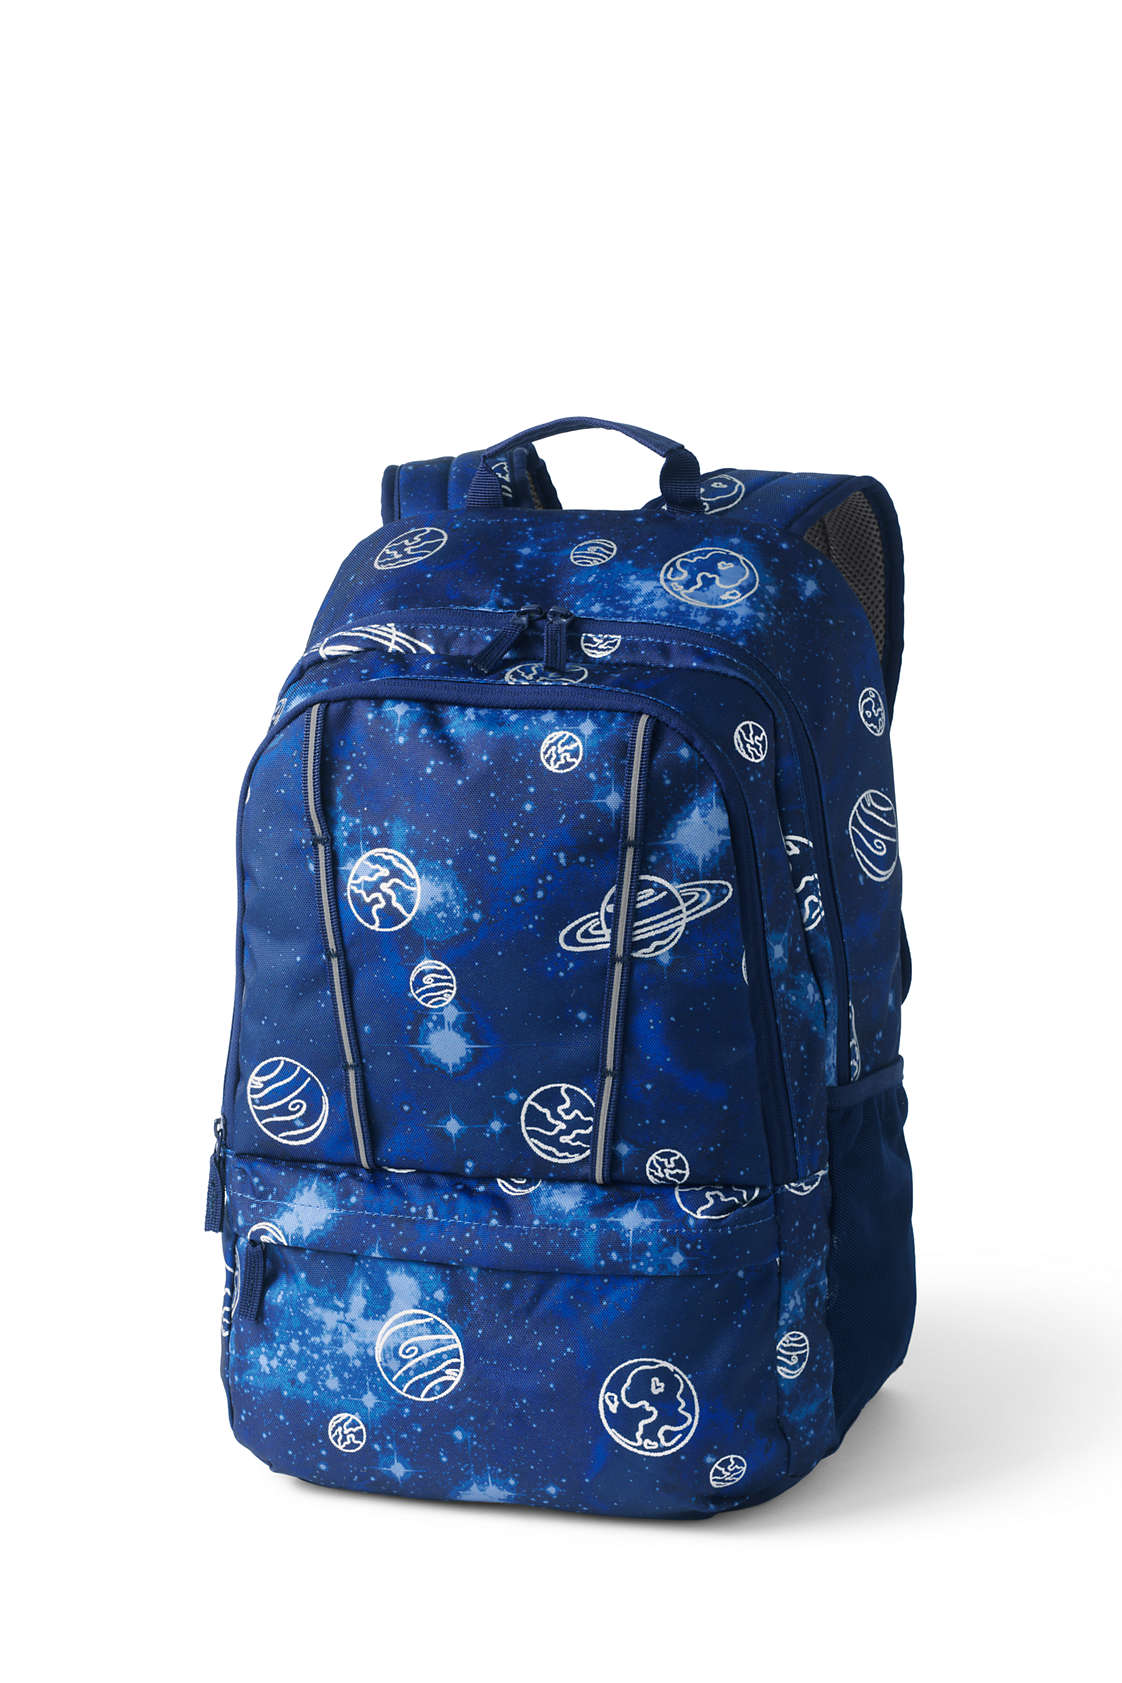 Lands End Kids Classmate Large Backpack in Deep Sea Space, $30-.jpeg